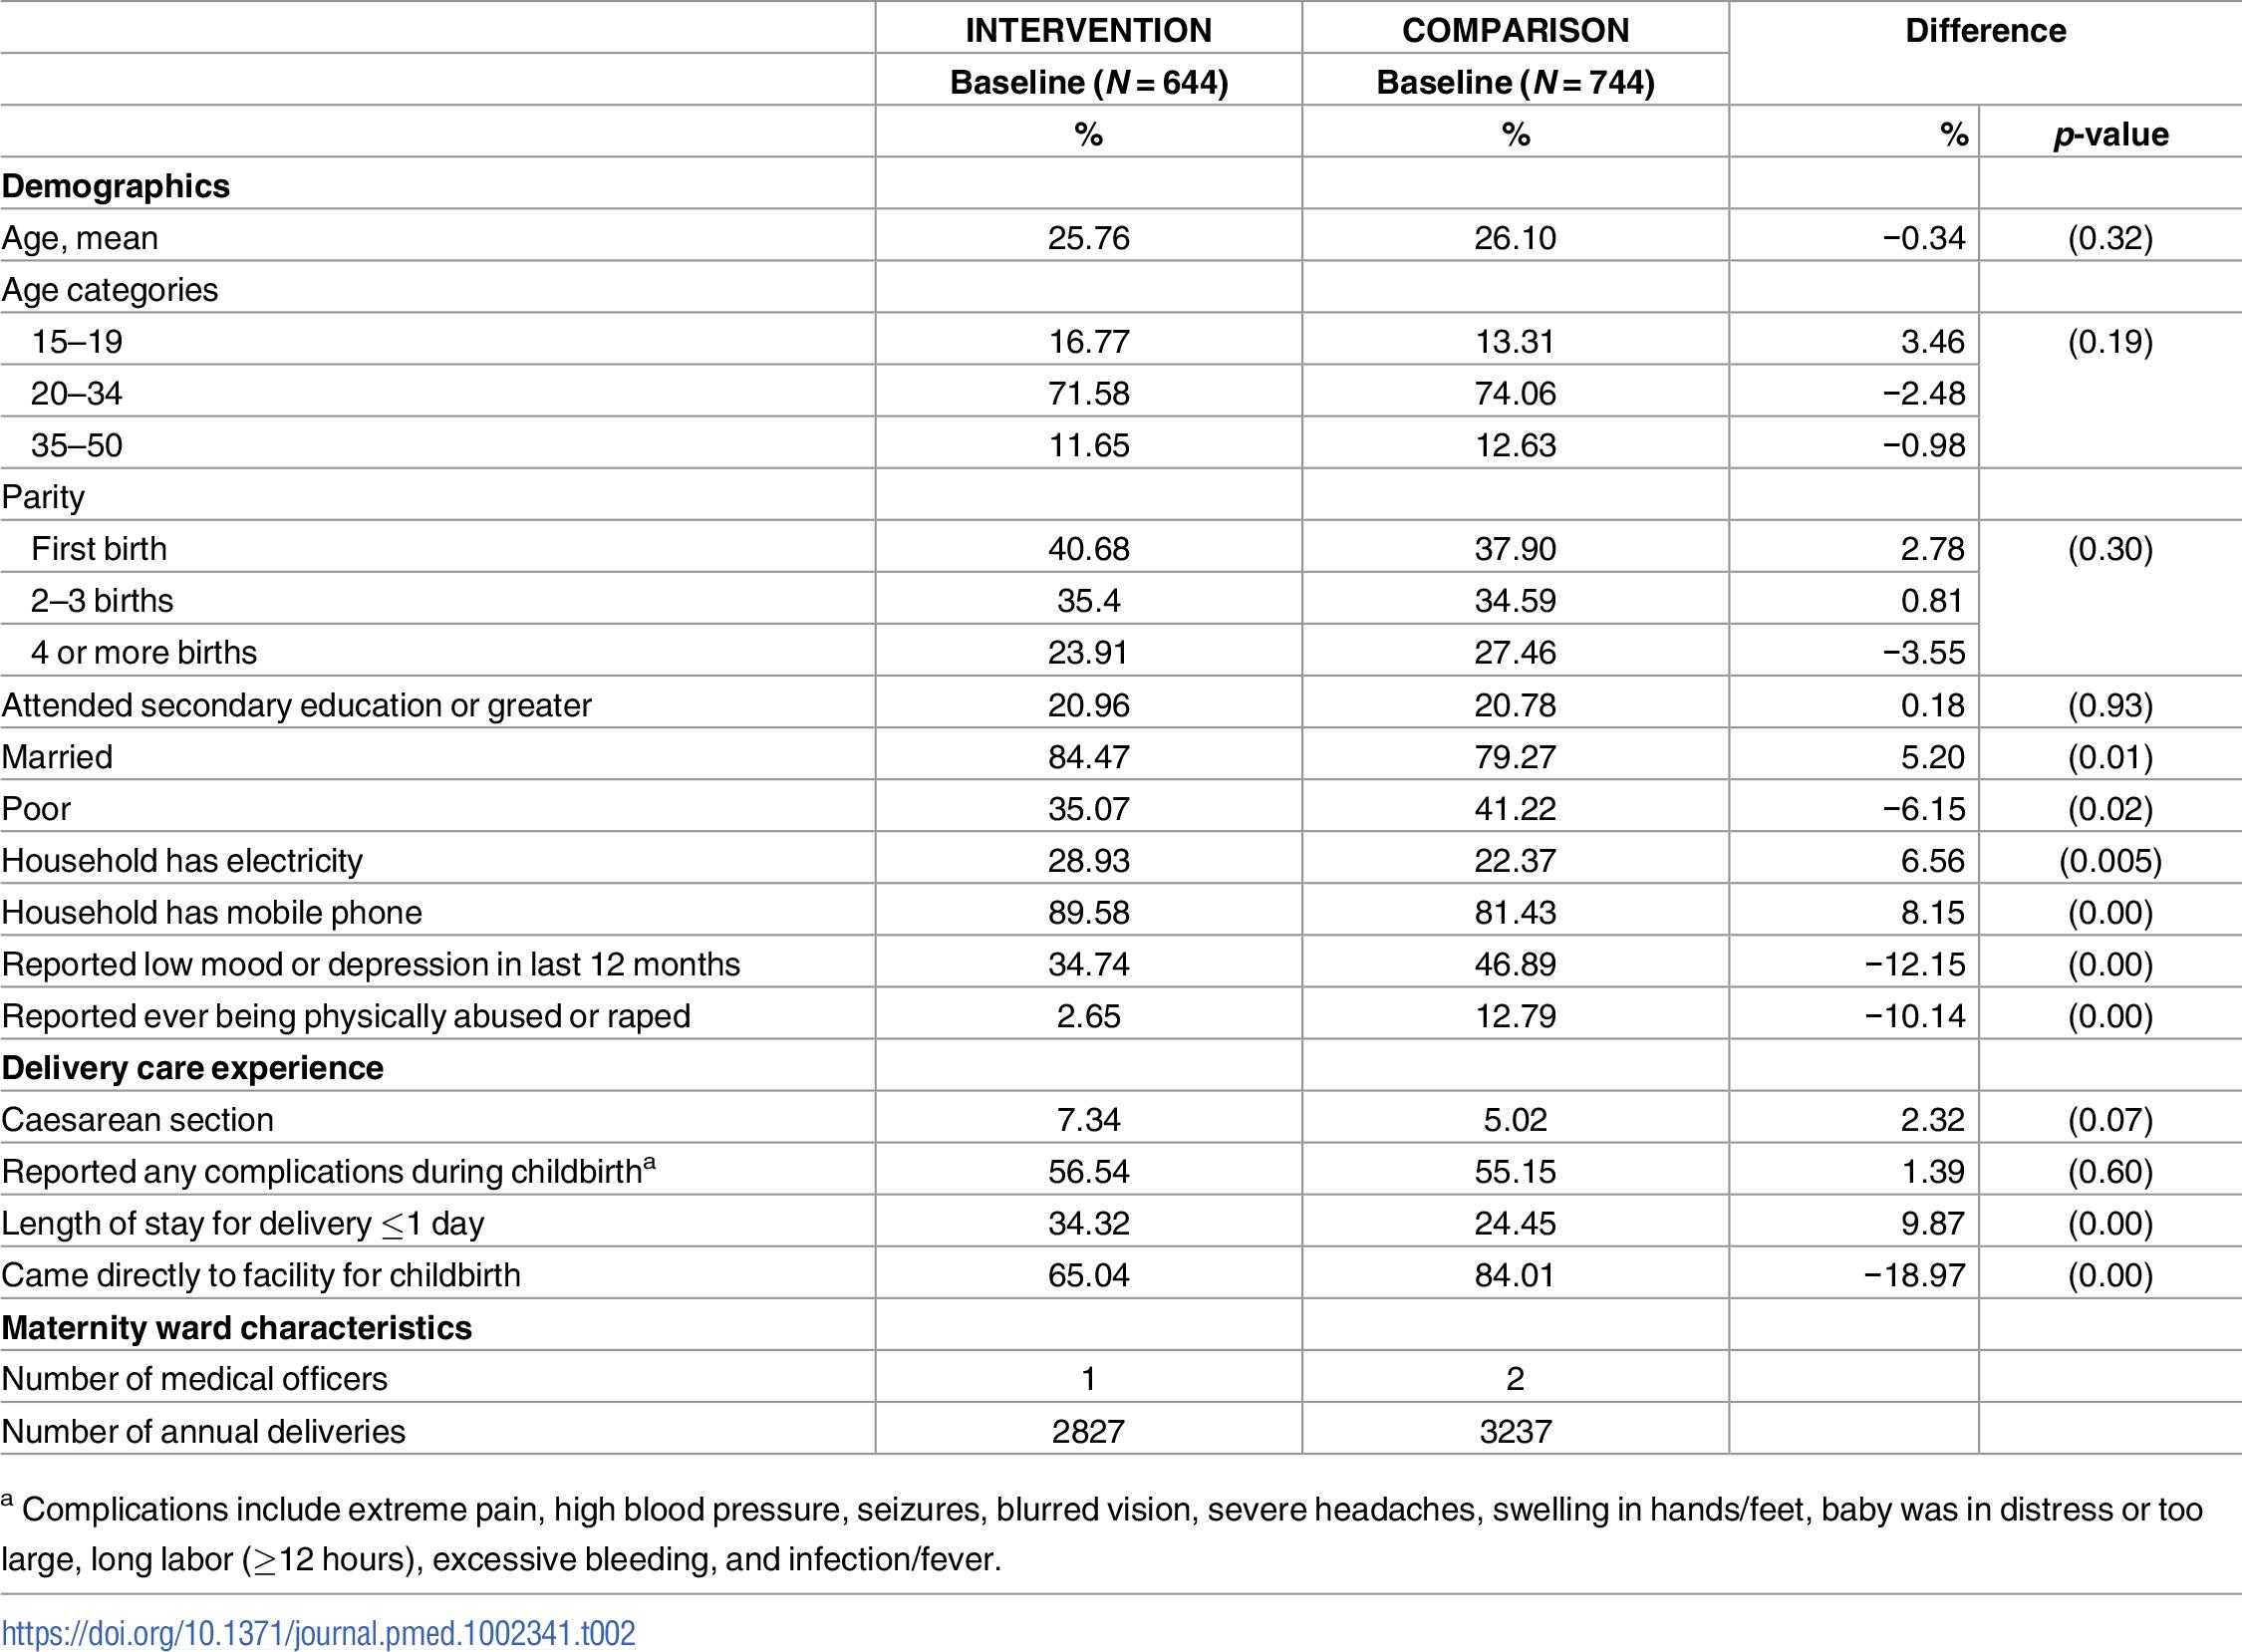 Baseline characteristics of survey respondents from 2 health facilities in Tanga Region, Tanzania, 2011–2012.